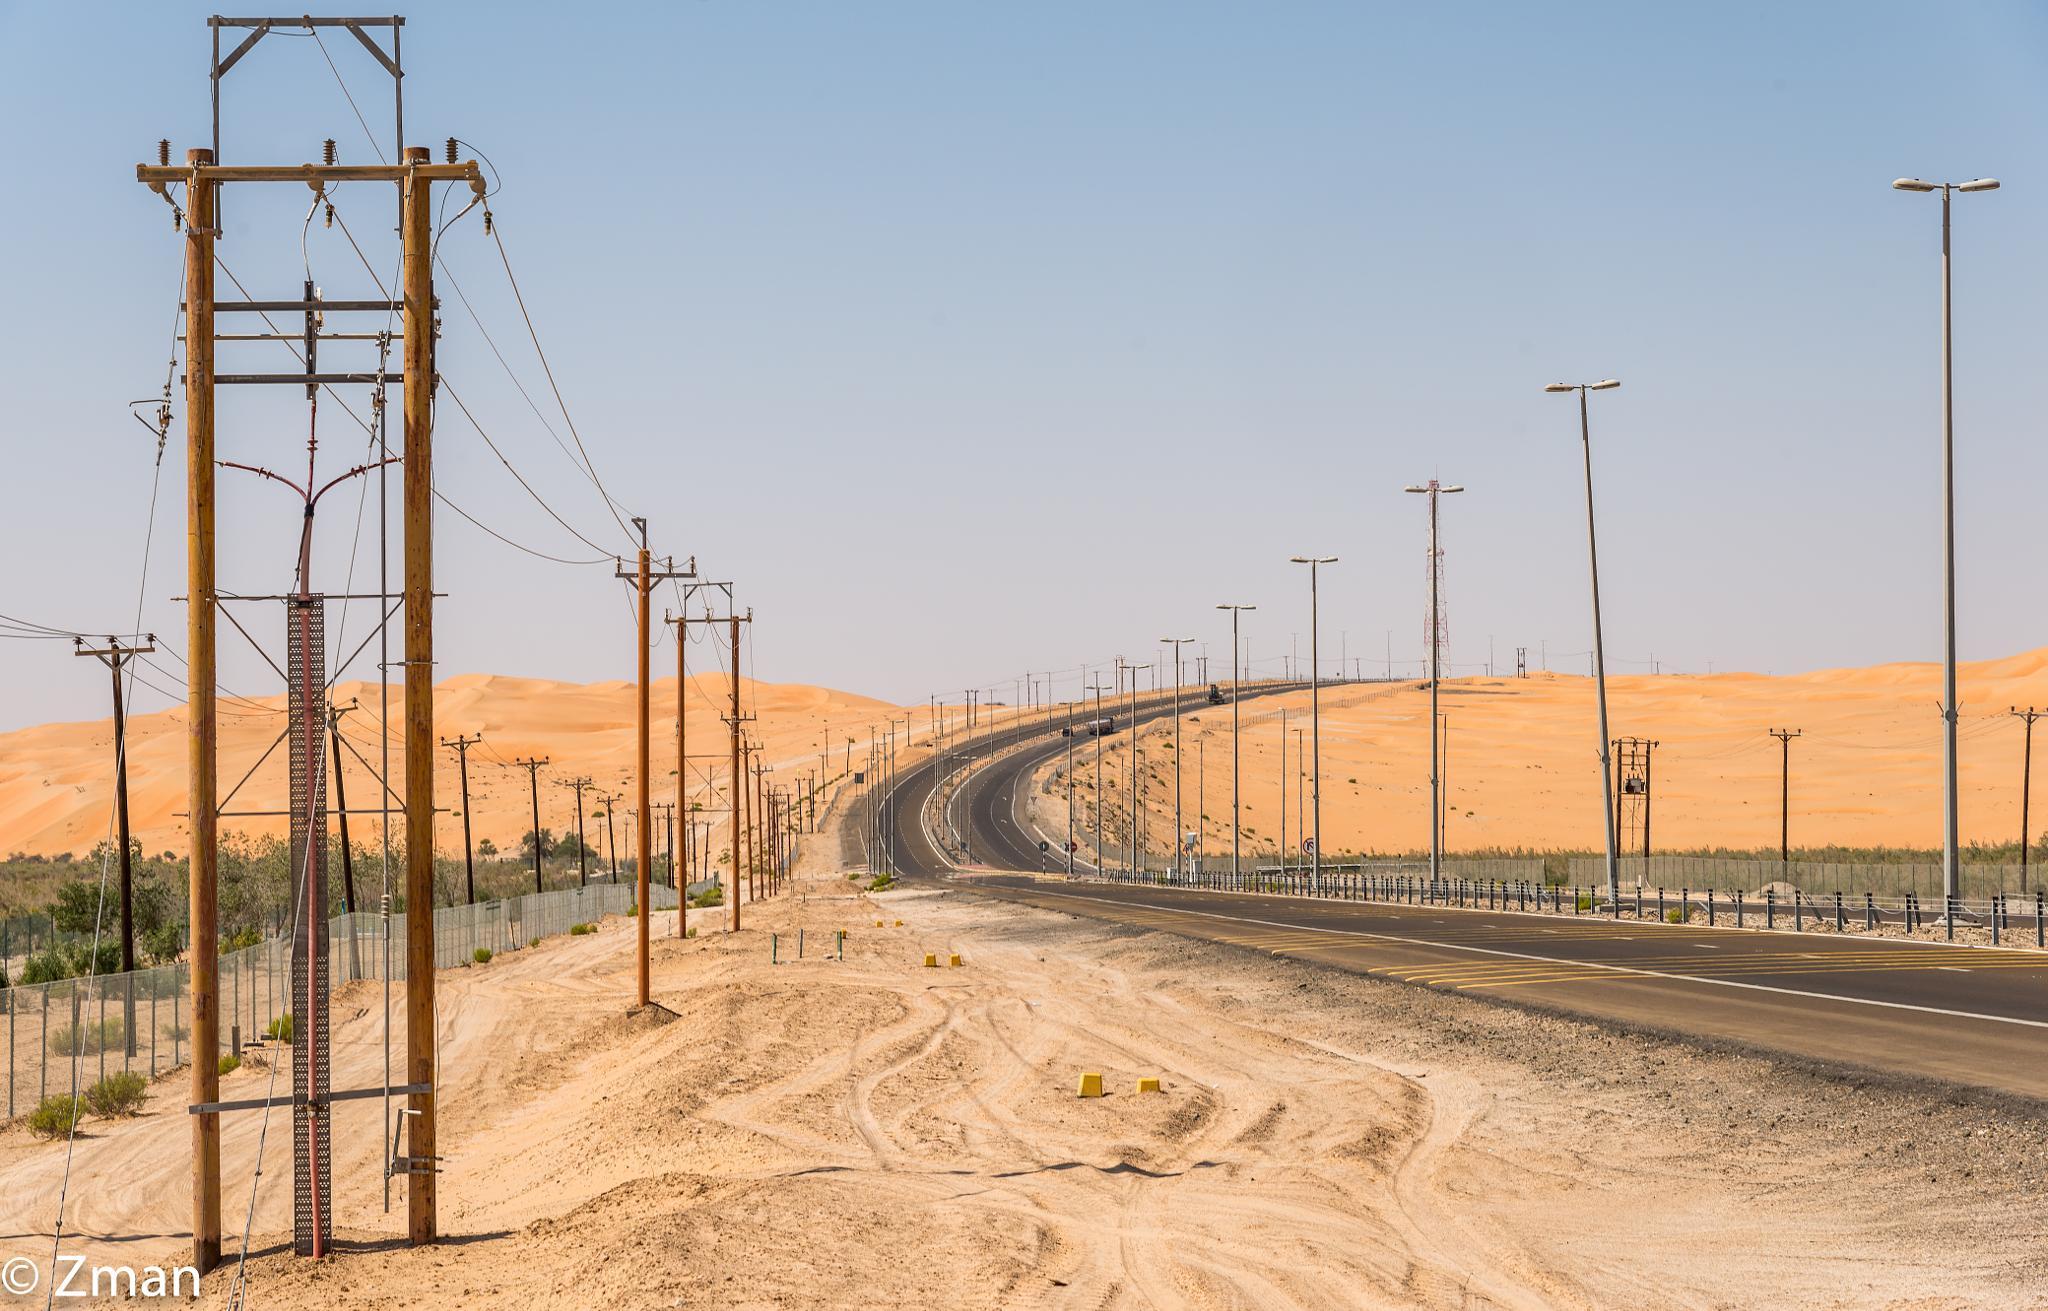 The Road To Qasr Alsarab by muhammad.nasser.963